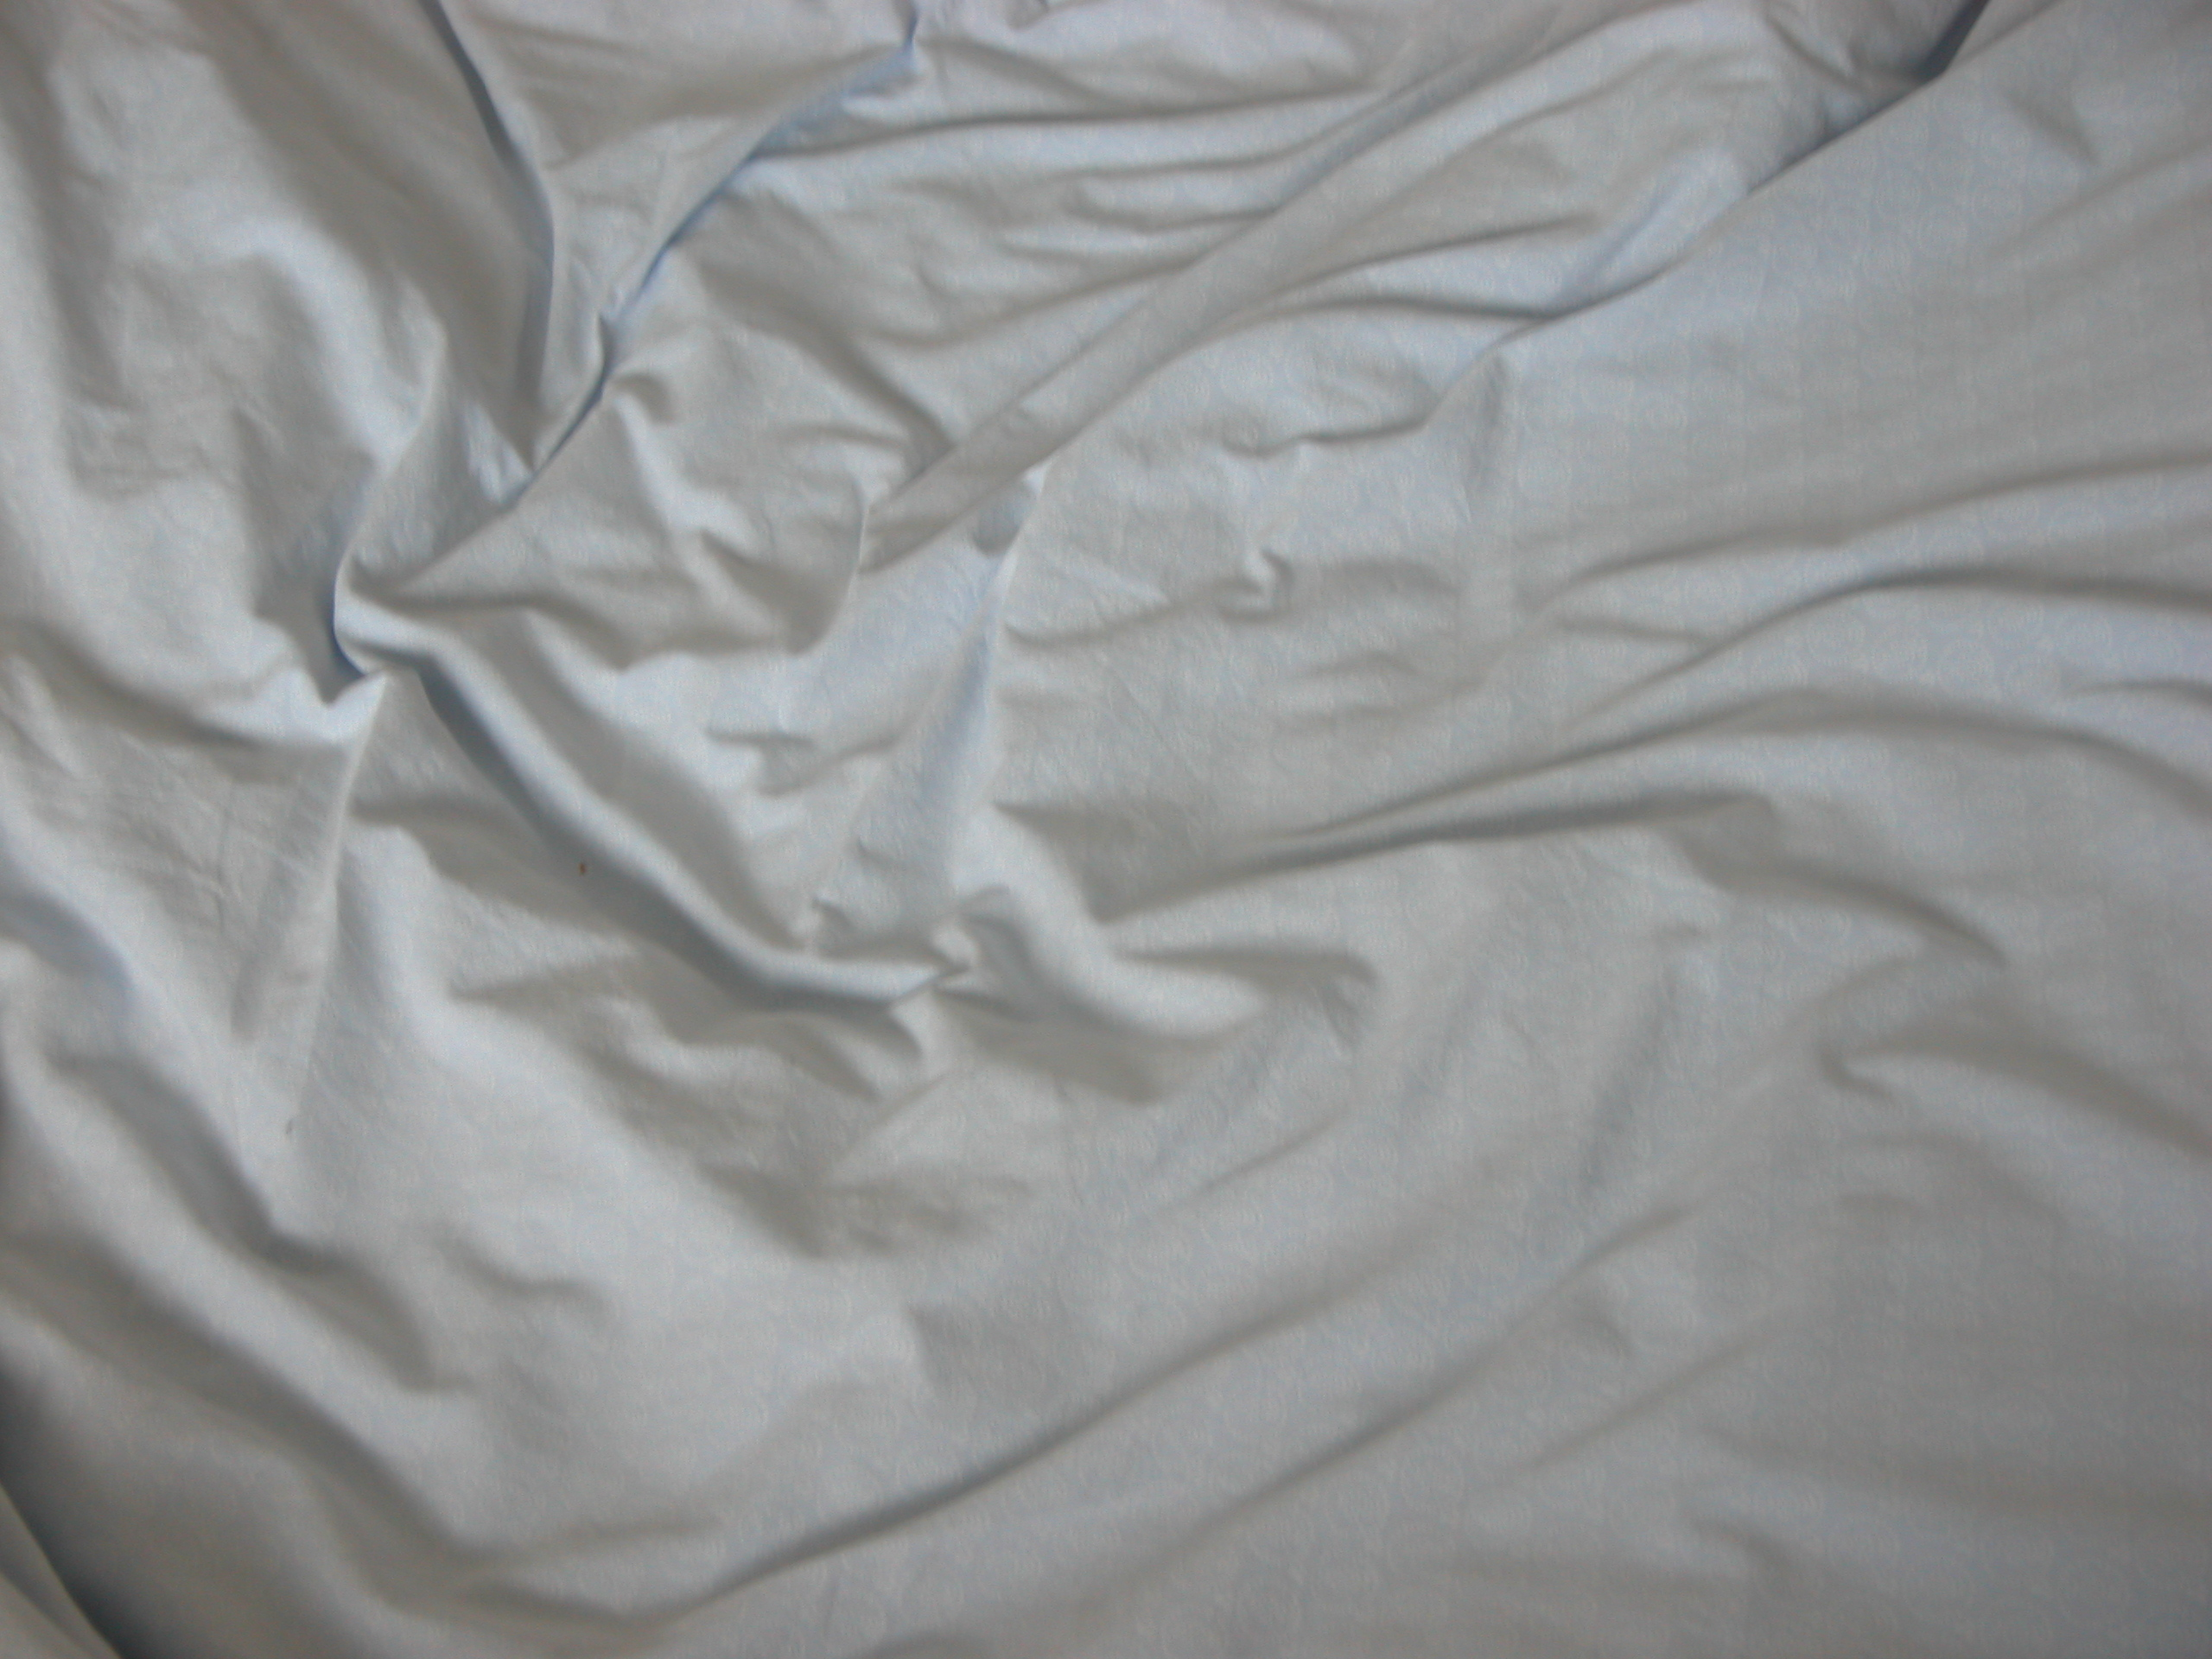 Black bed sheets tumblr - Sheet Like Building Material